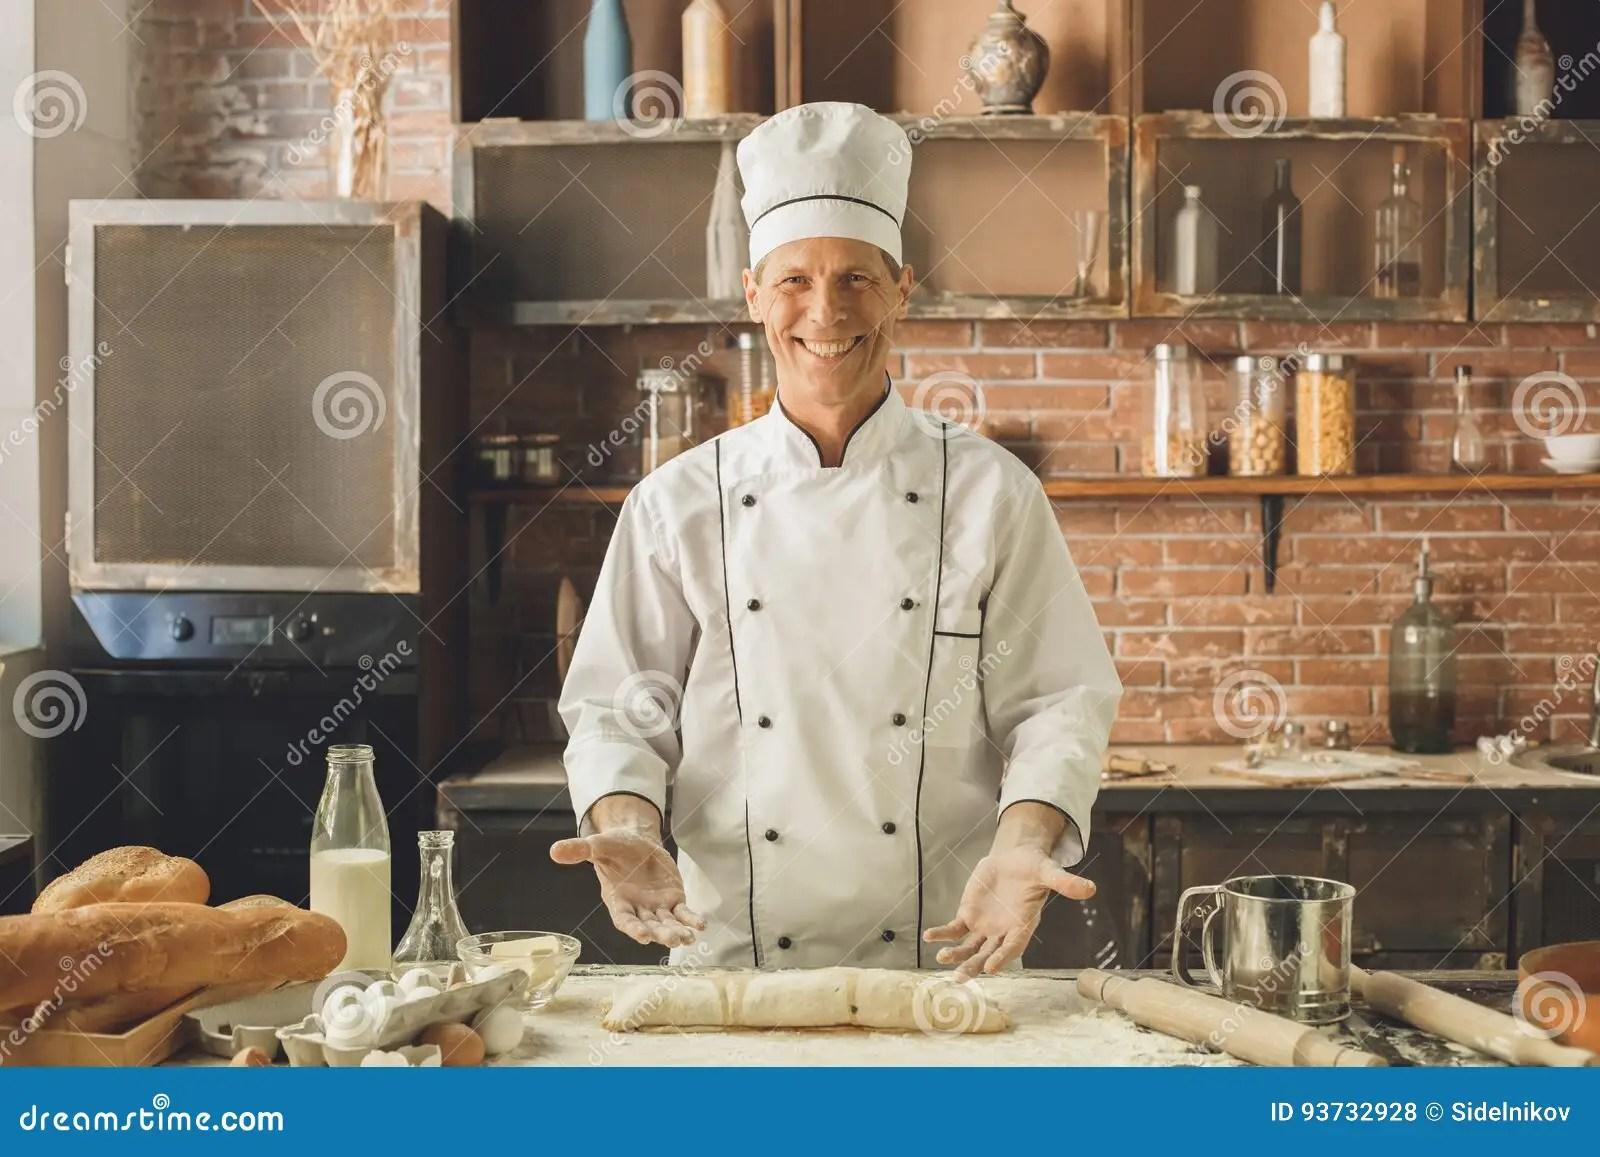 kitchen experts small floor tile ideas 面包店厨师烹调在厨房专家烘烤库存照片 图片包括有食物 专业人员 成人 面包店厨师烹调在厨房专业制造的卷烘烤